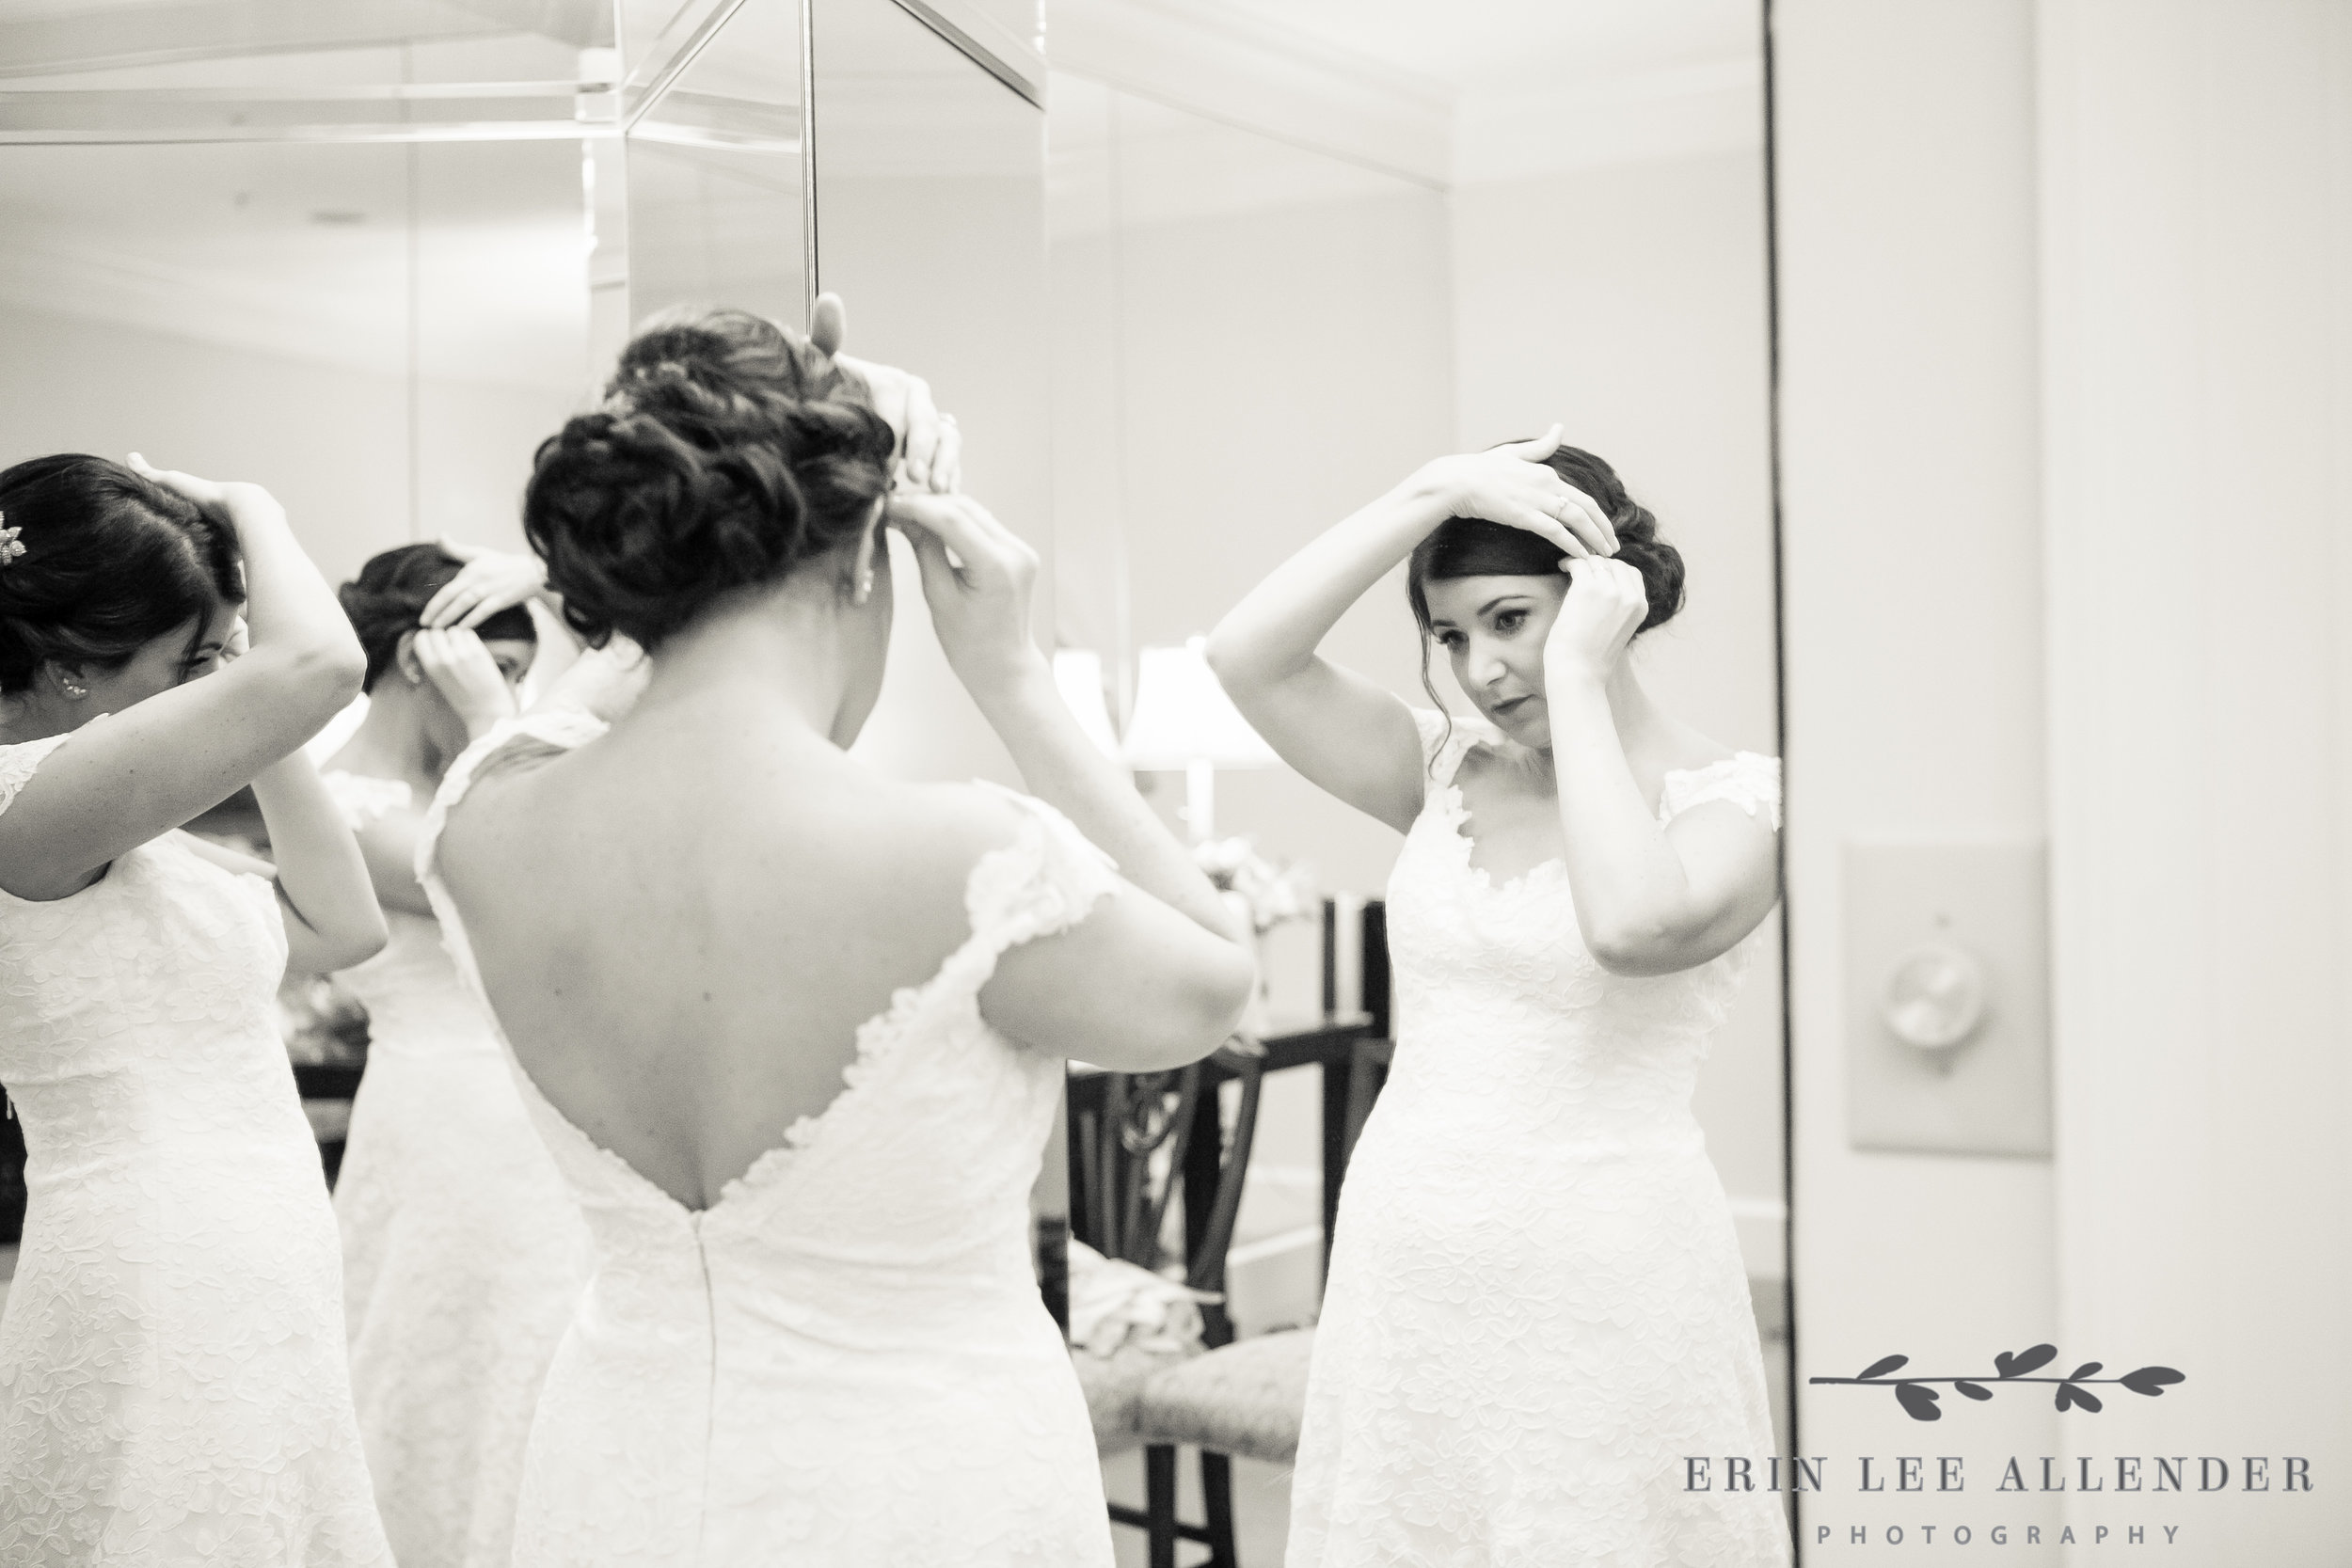 Bride_Fixing_Her_Hair_In_Mirror